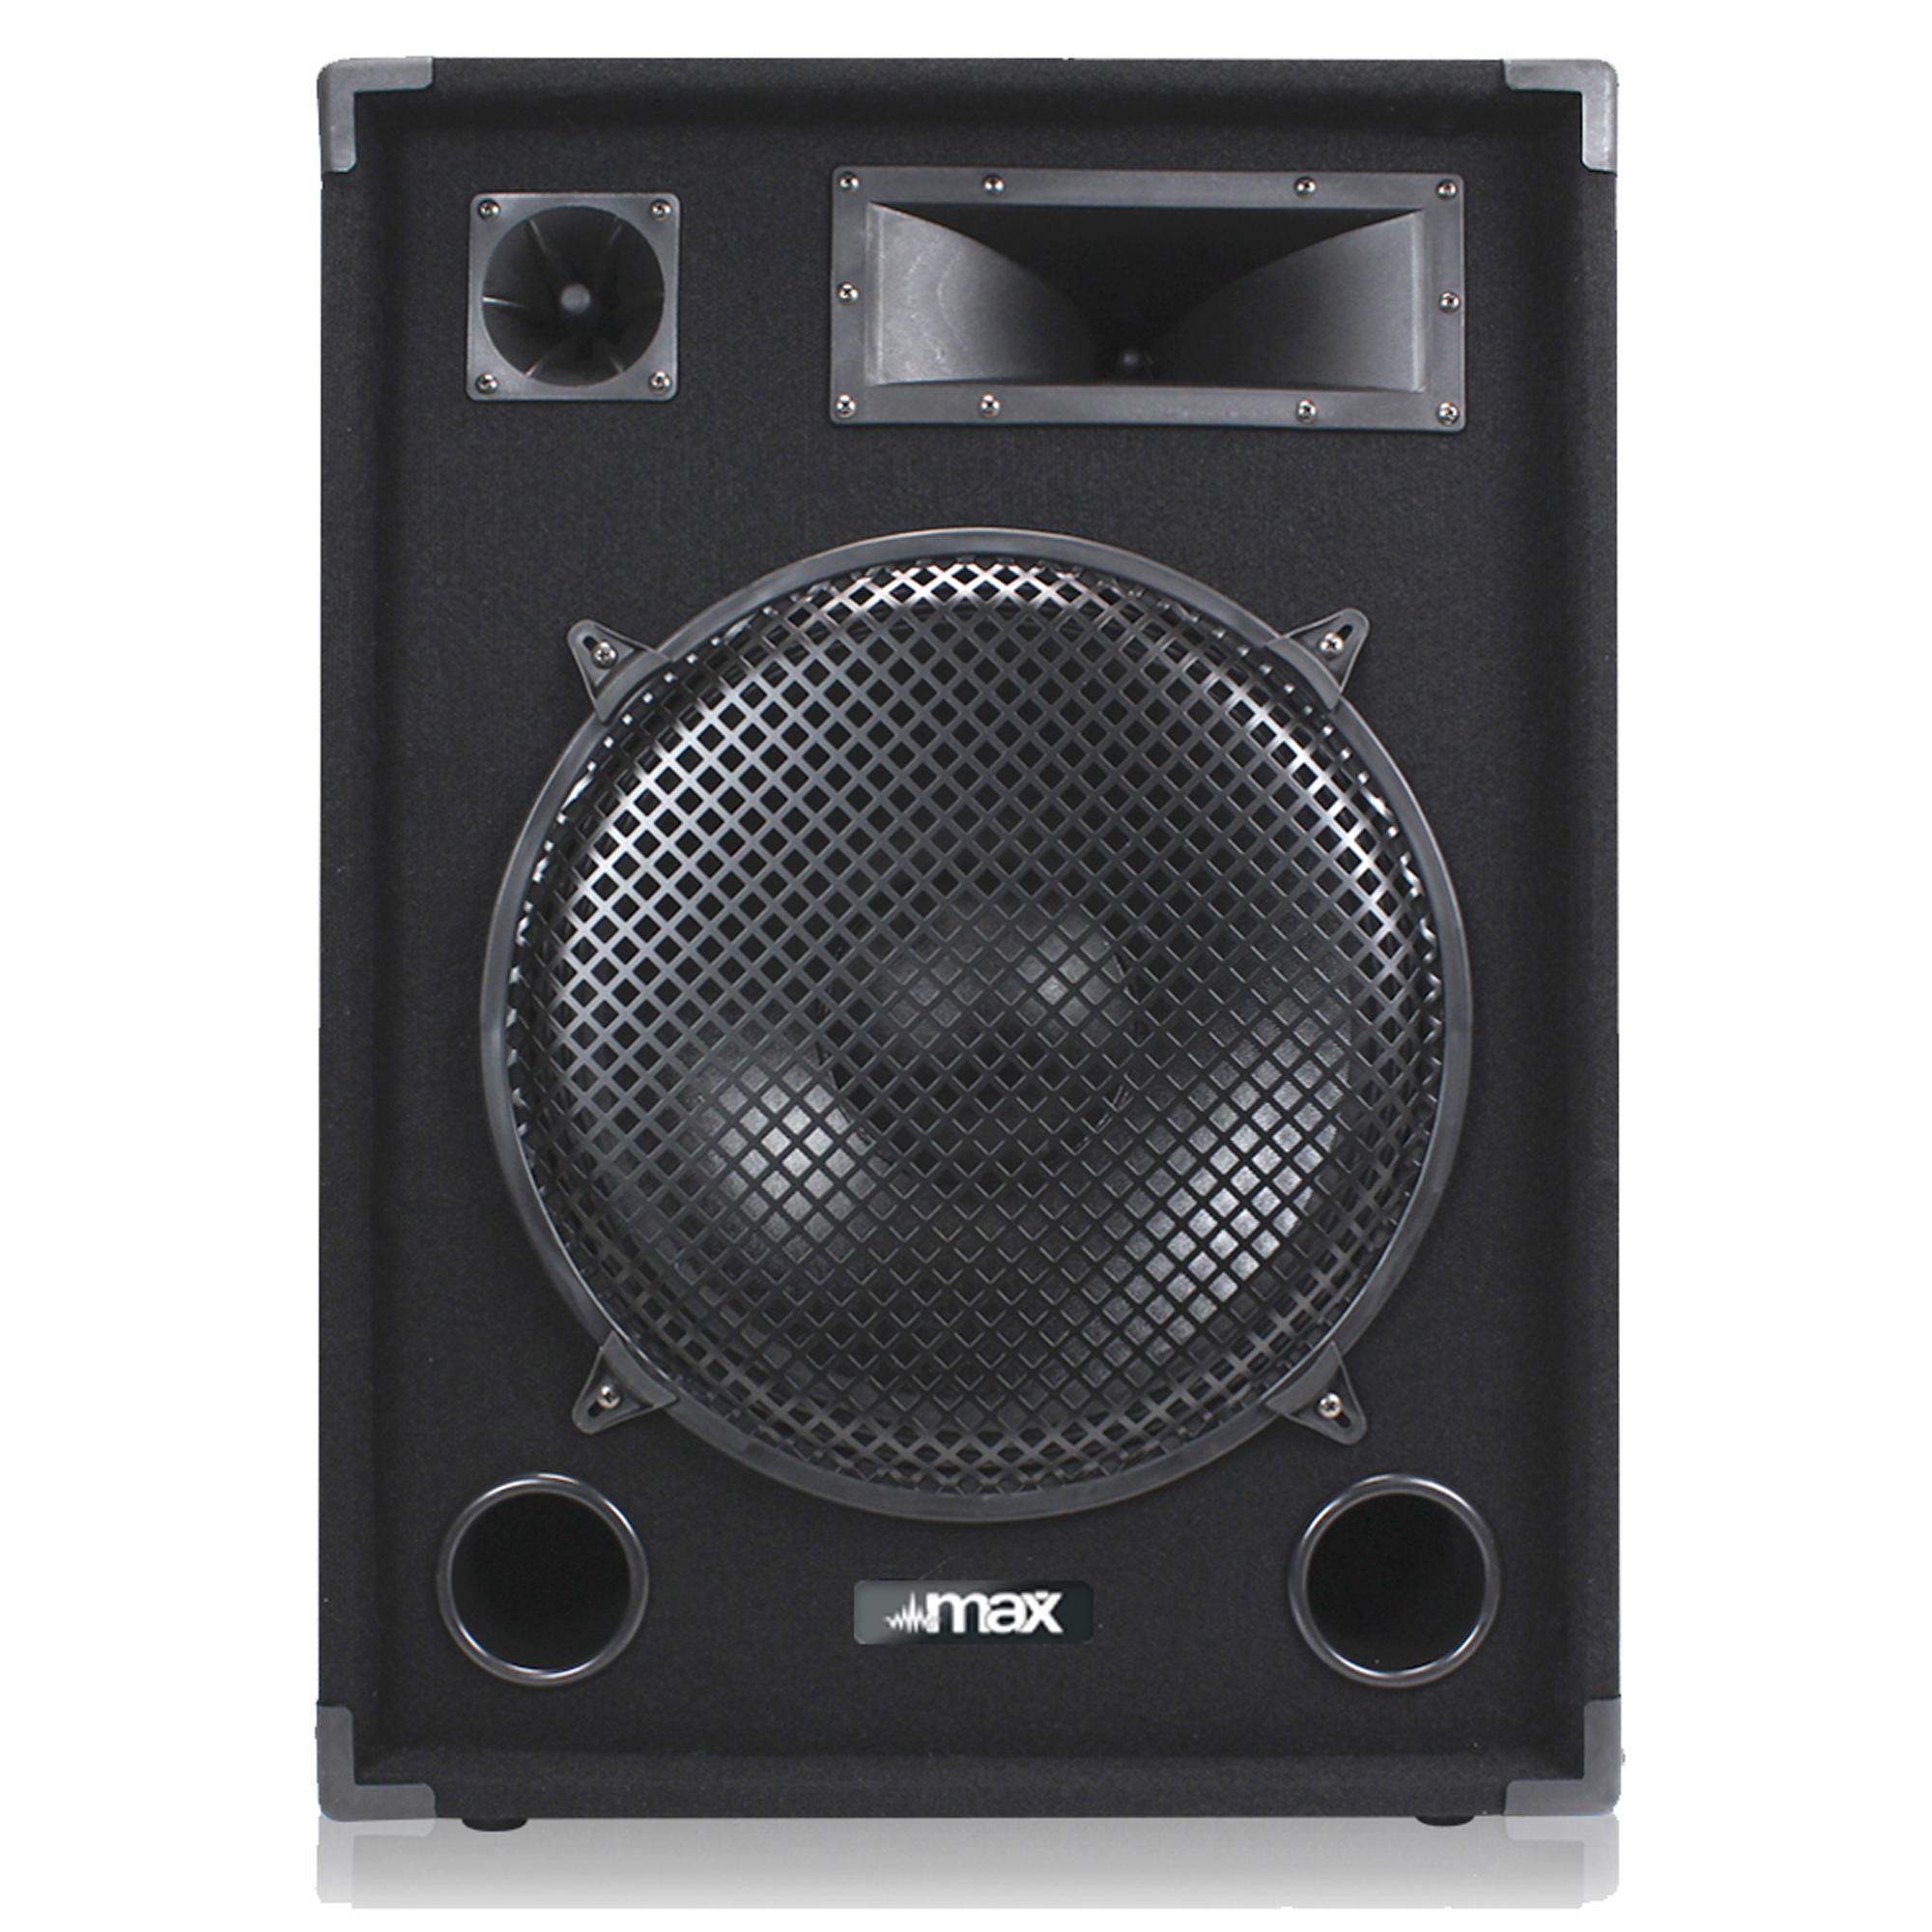 Amazing Max Sp15 Dj Speaker 15 1000W Full Range Woofer Bedroom Dj Mobile Disco Party Download Free Architecture Designs Rallybritishbridgeorg